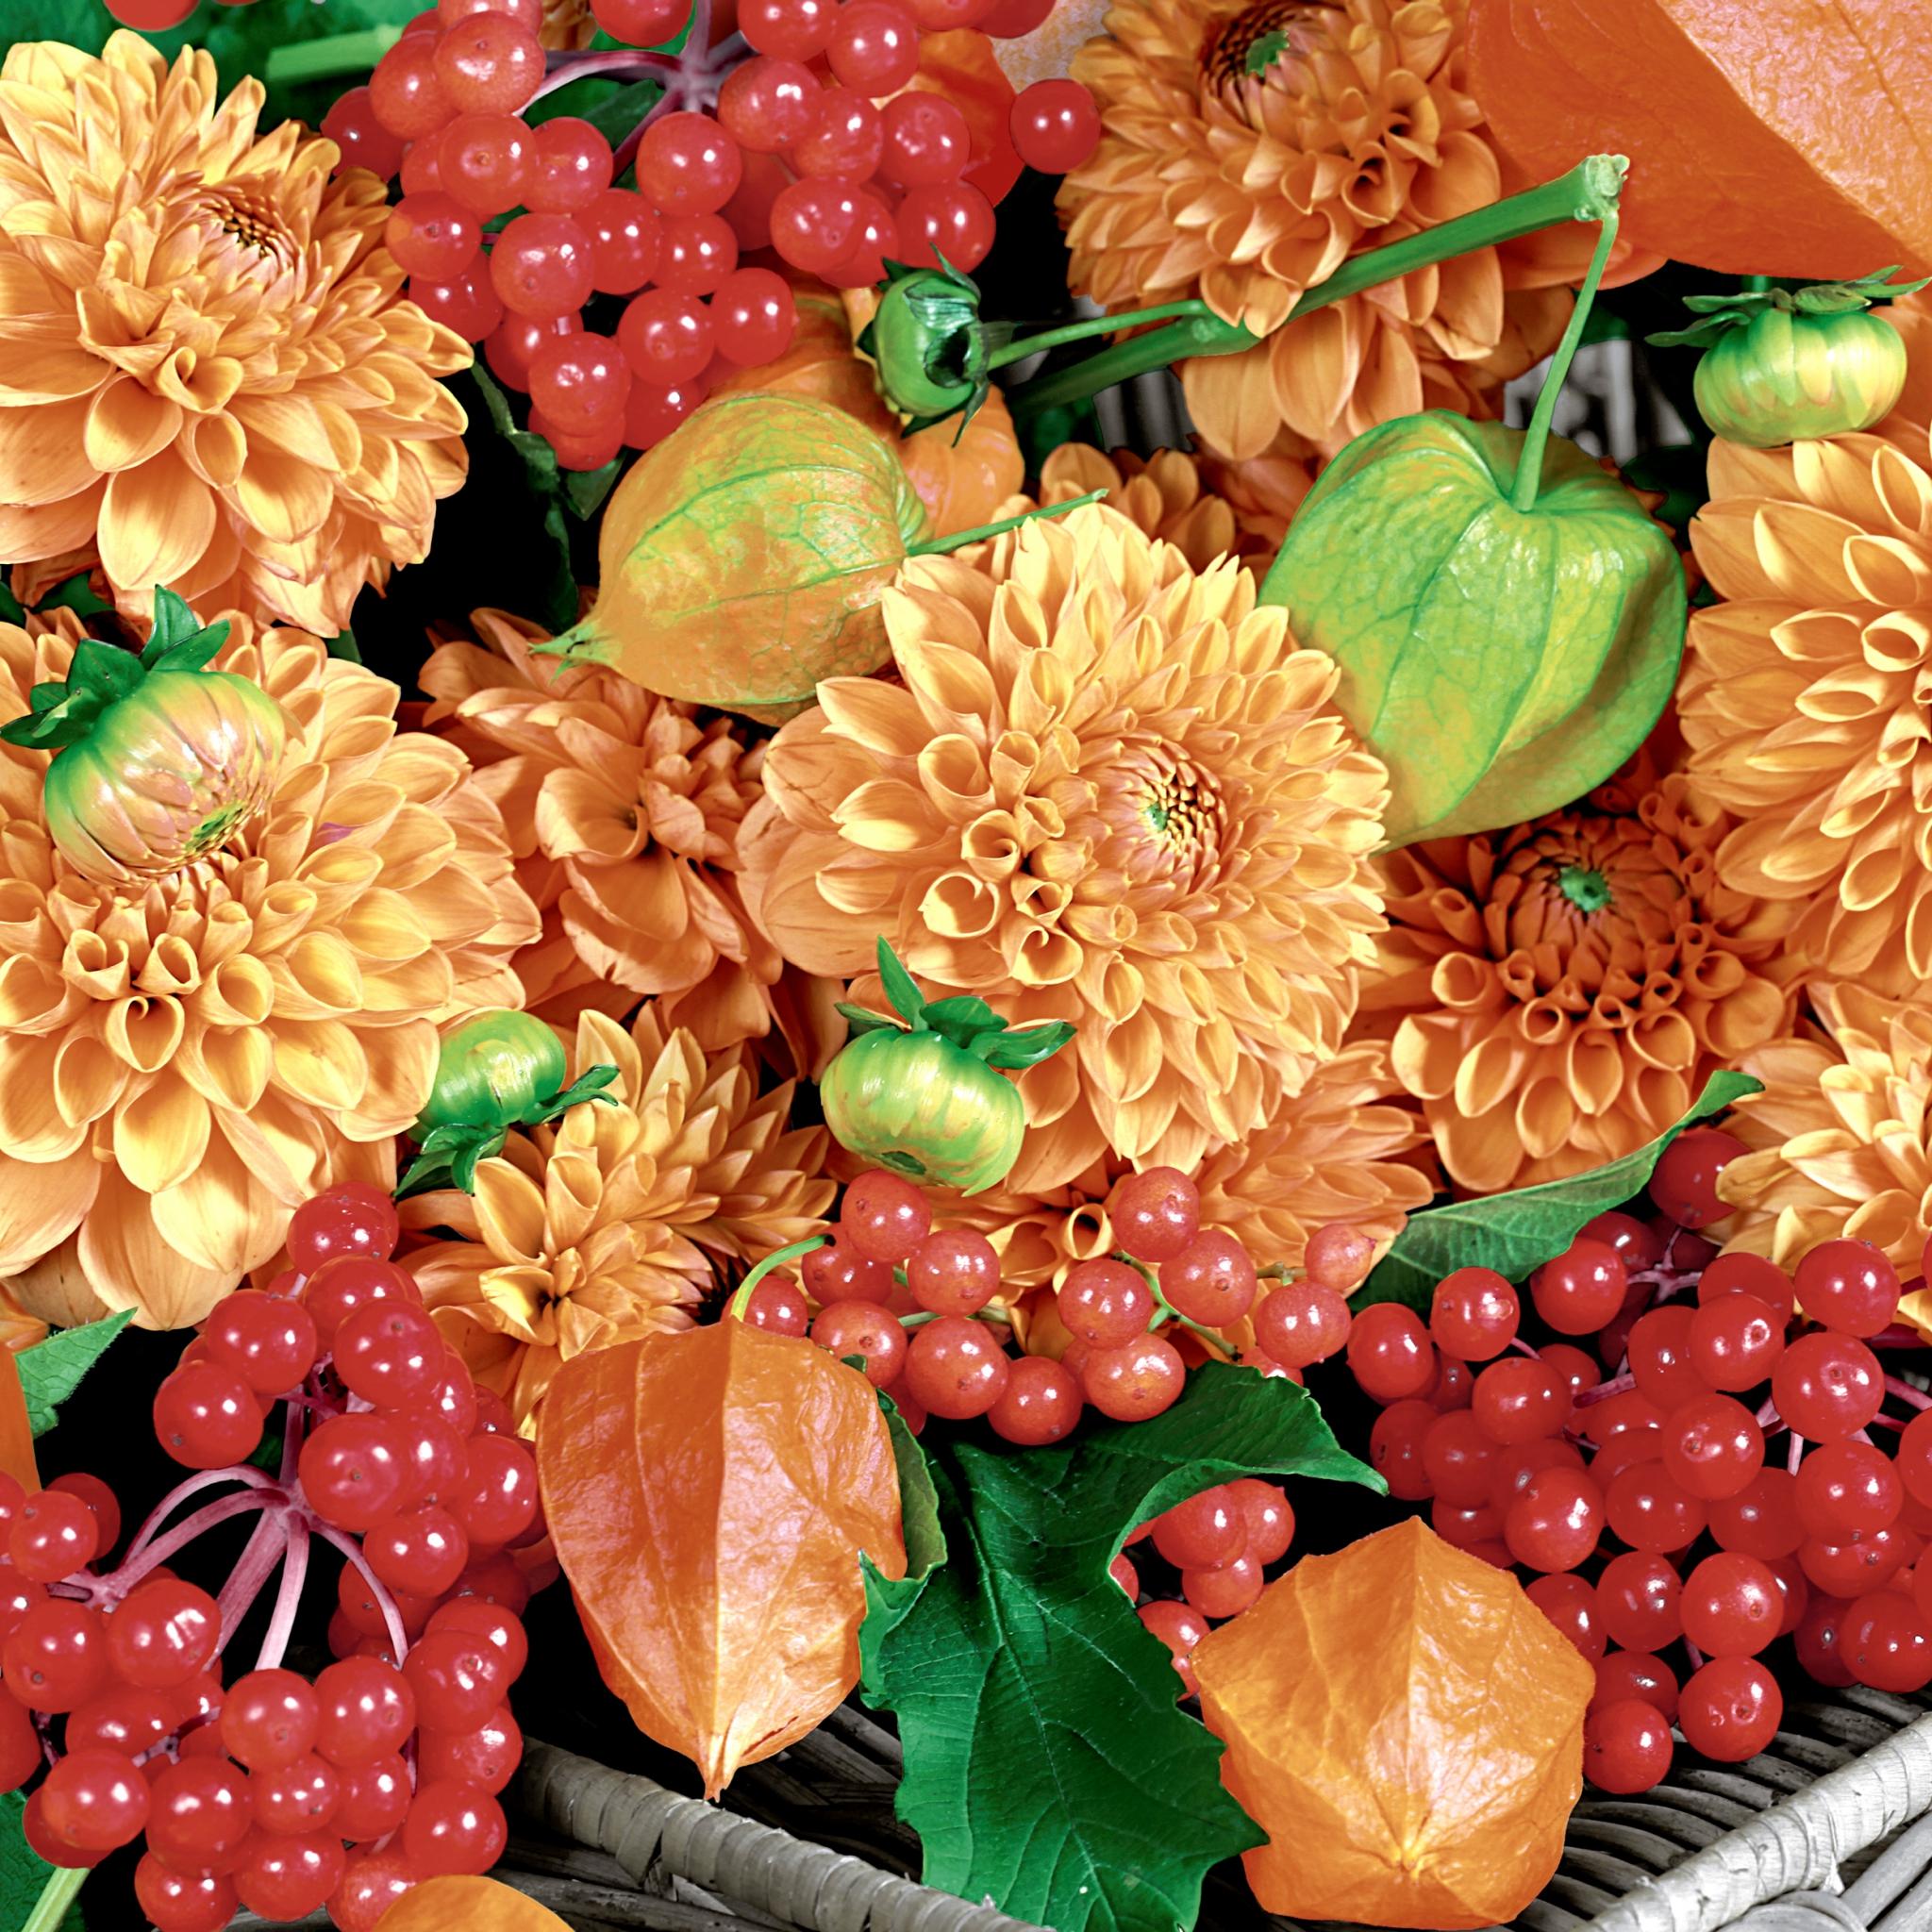 Servilletas 24x24 cm - Flowers & fruits